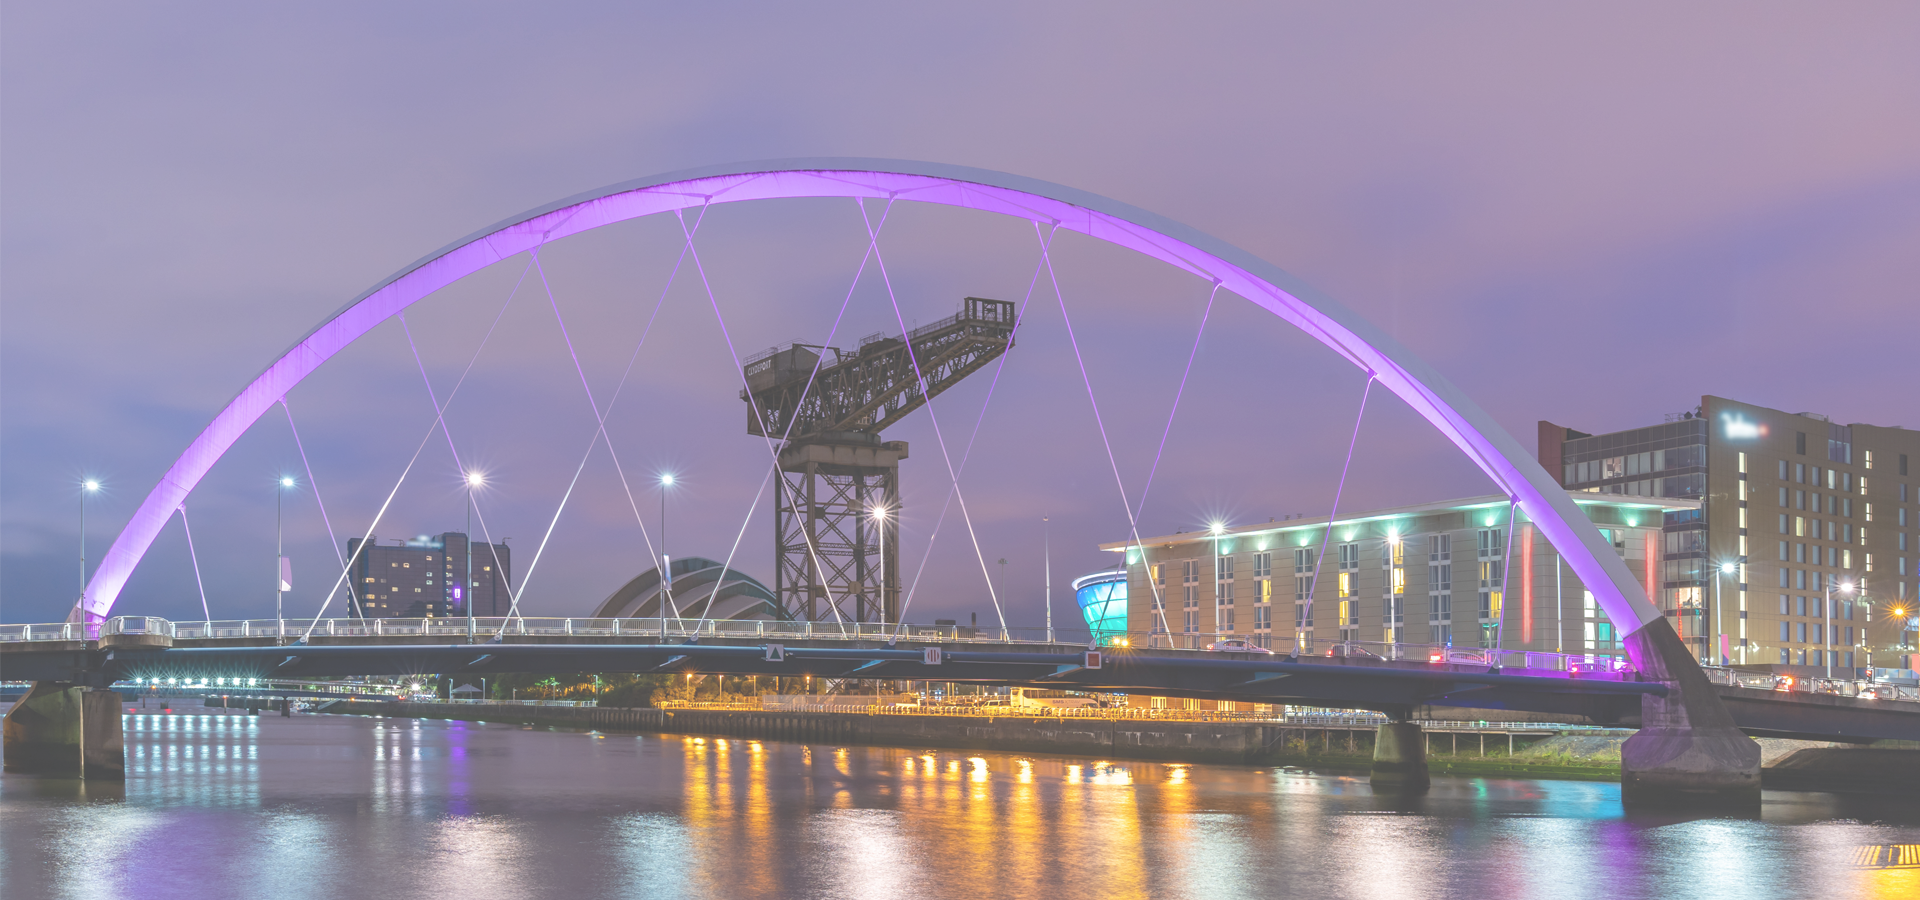 Peer-to-peer advisory in Glasgow, Glasgow City, Scotland, Great Britain